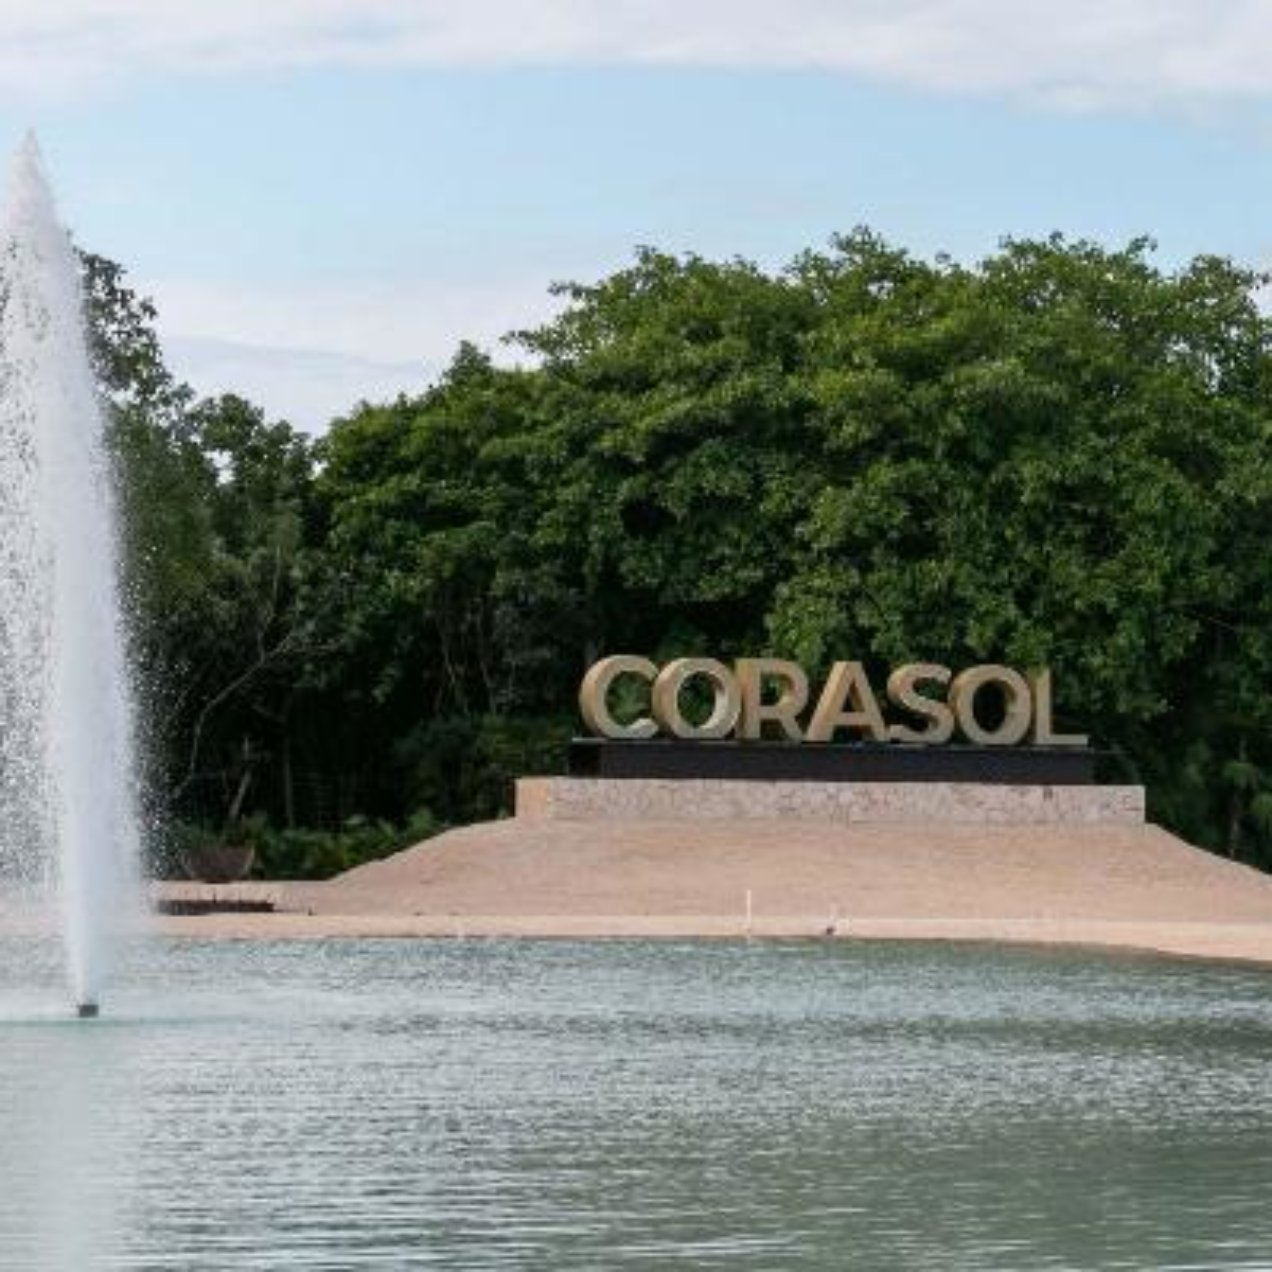 Corasol: Your Next Destination for your Getaway